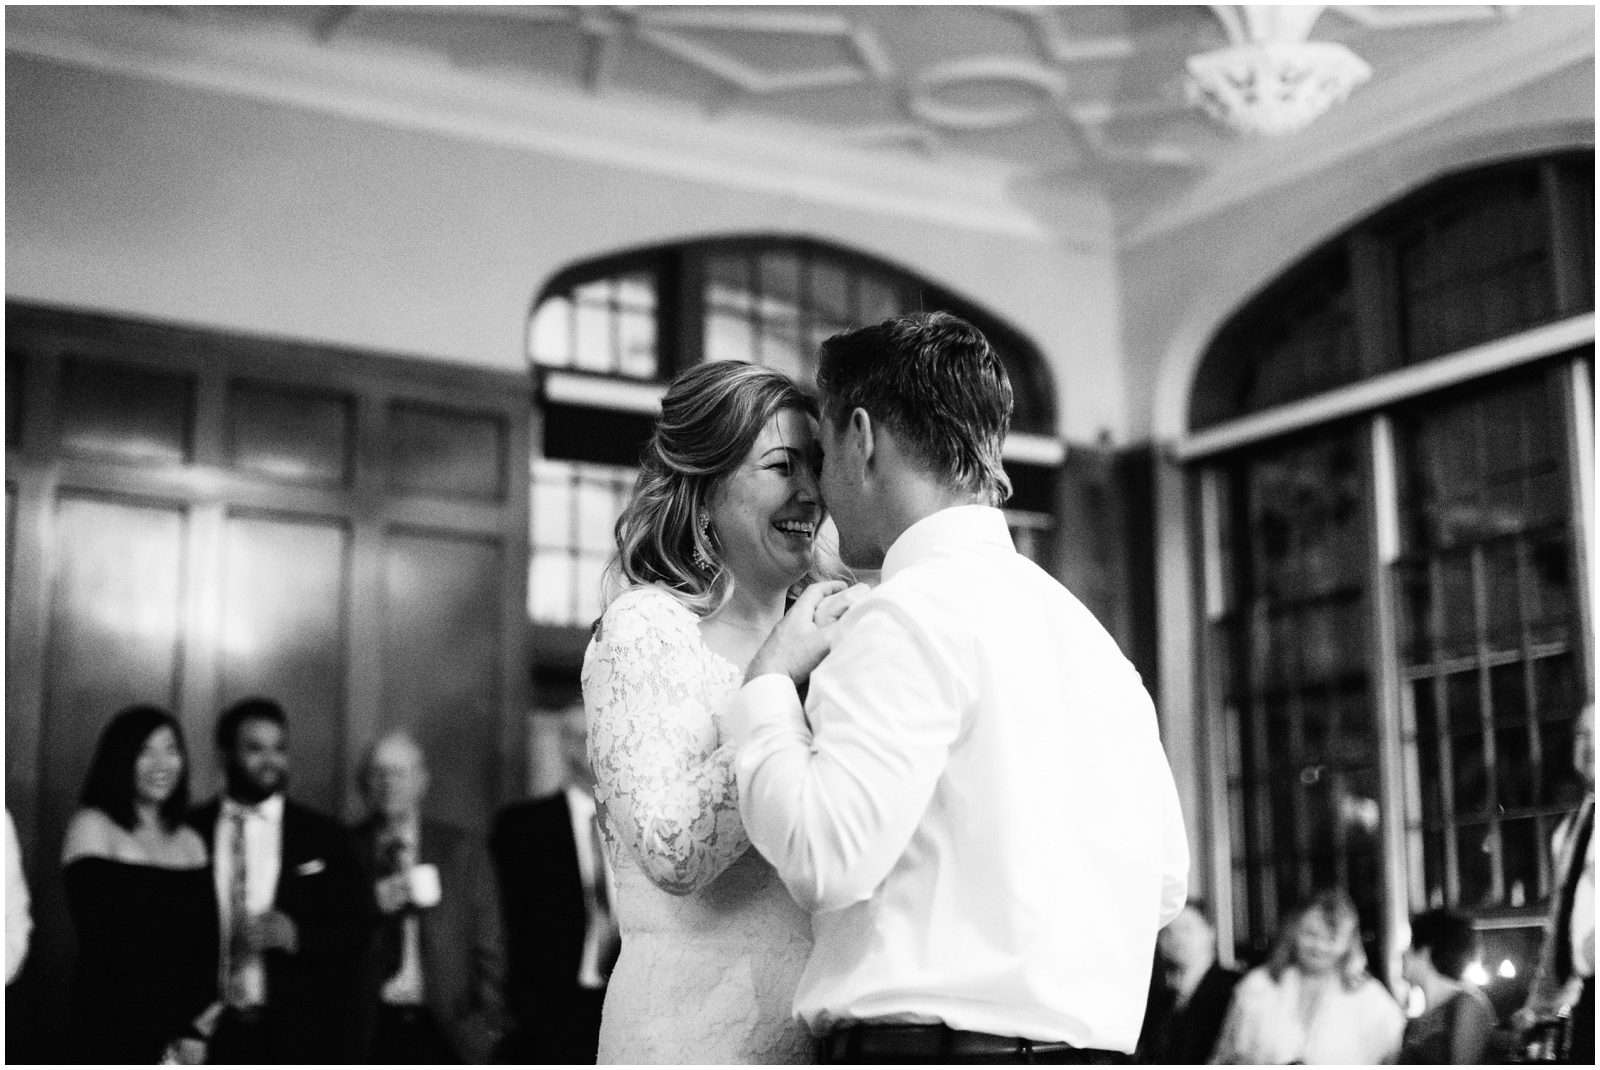 Minnesota Wedding Planner, Mpls Wedding Planner, Machine Shop MPLS, Mpls Wedding Venue. Bride and groom dancing